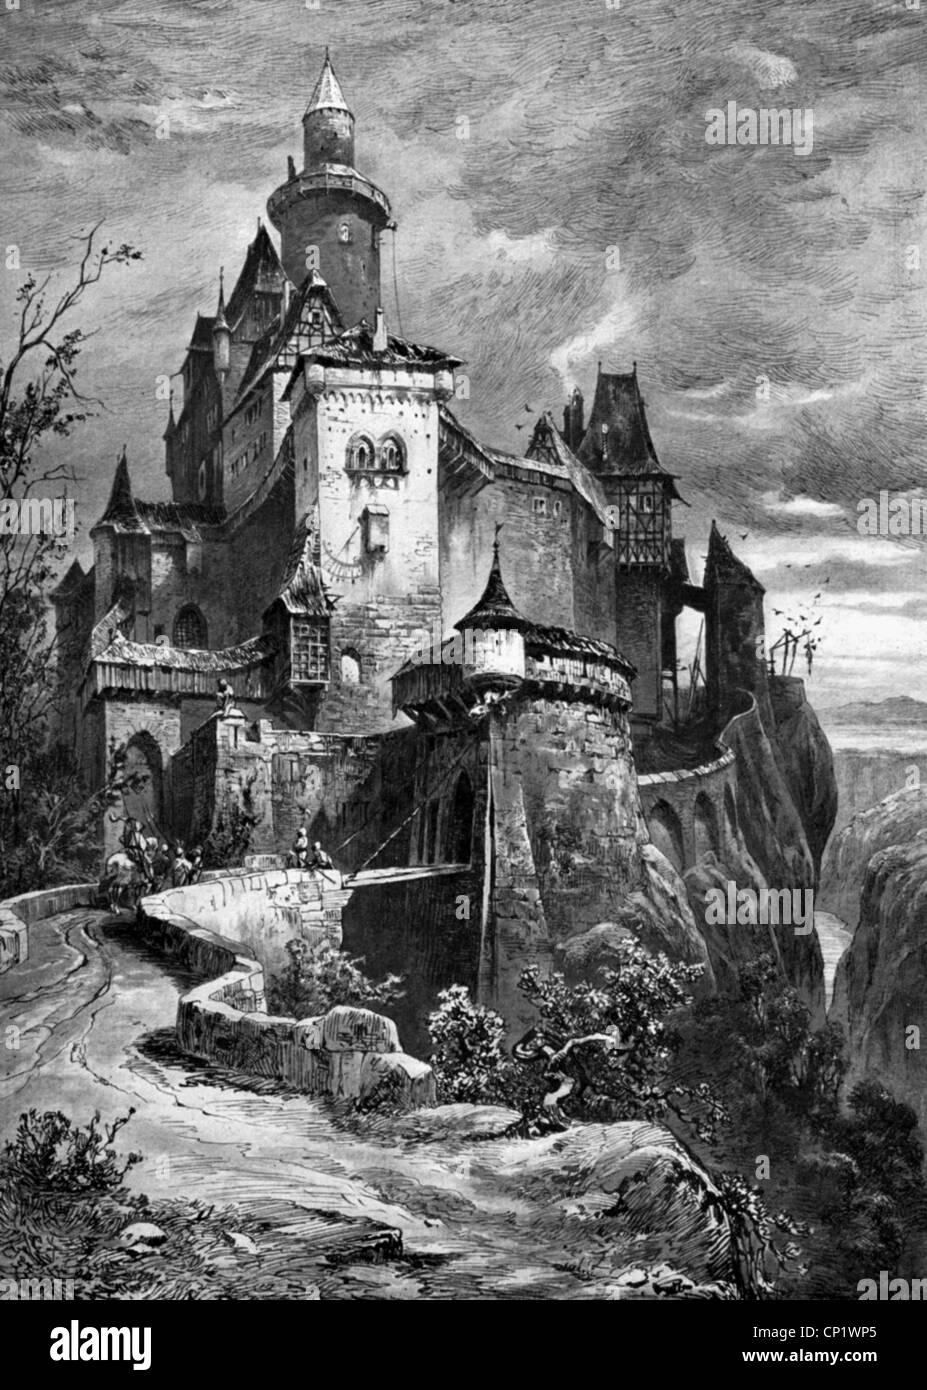 Moyen Age L Architecture Chateau Fort Illustration 19e Siecle